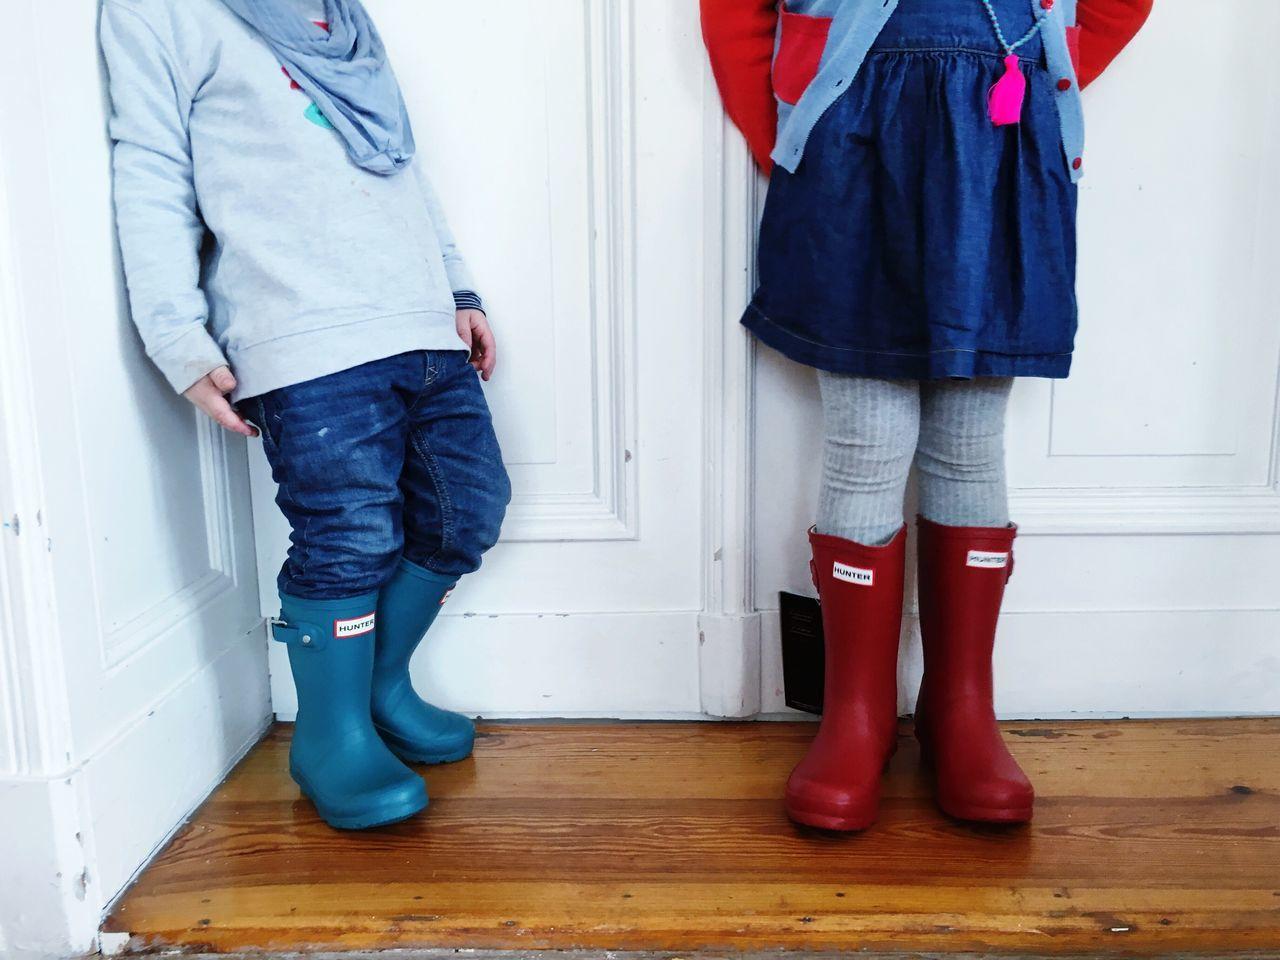 Wellies  Hunters Boots Siblings Raining